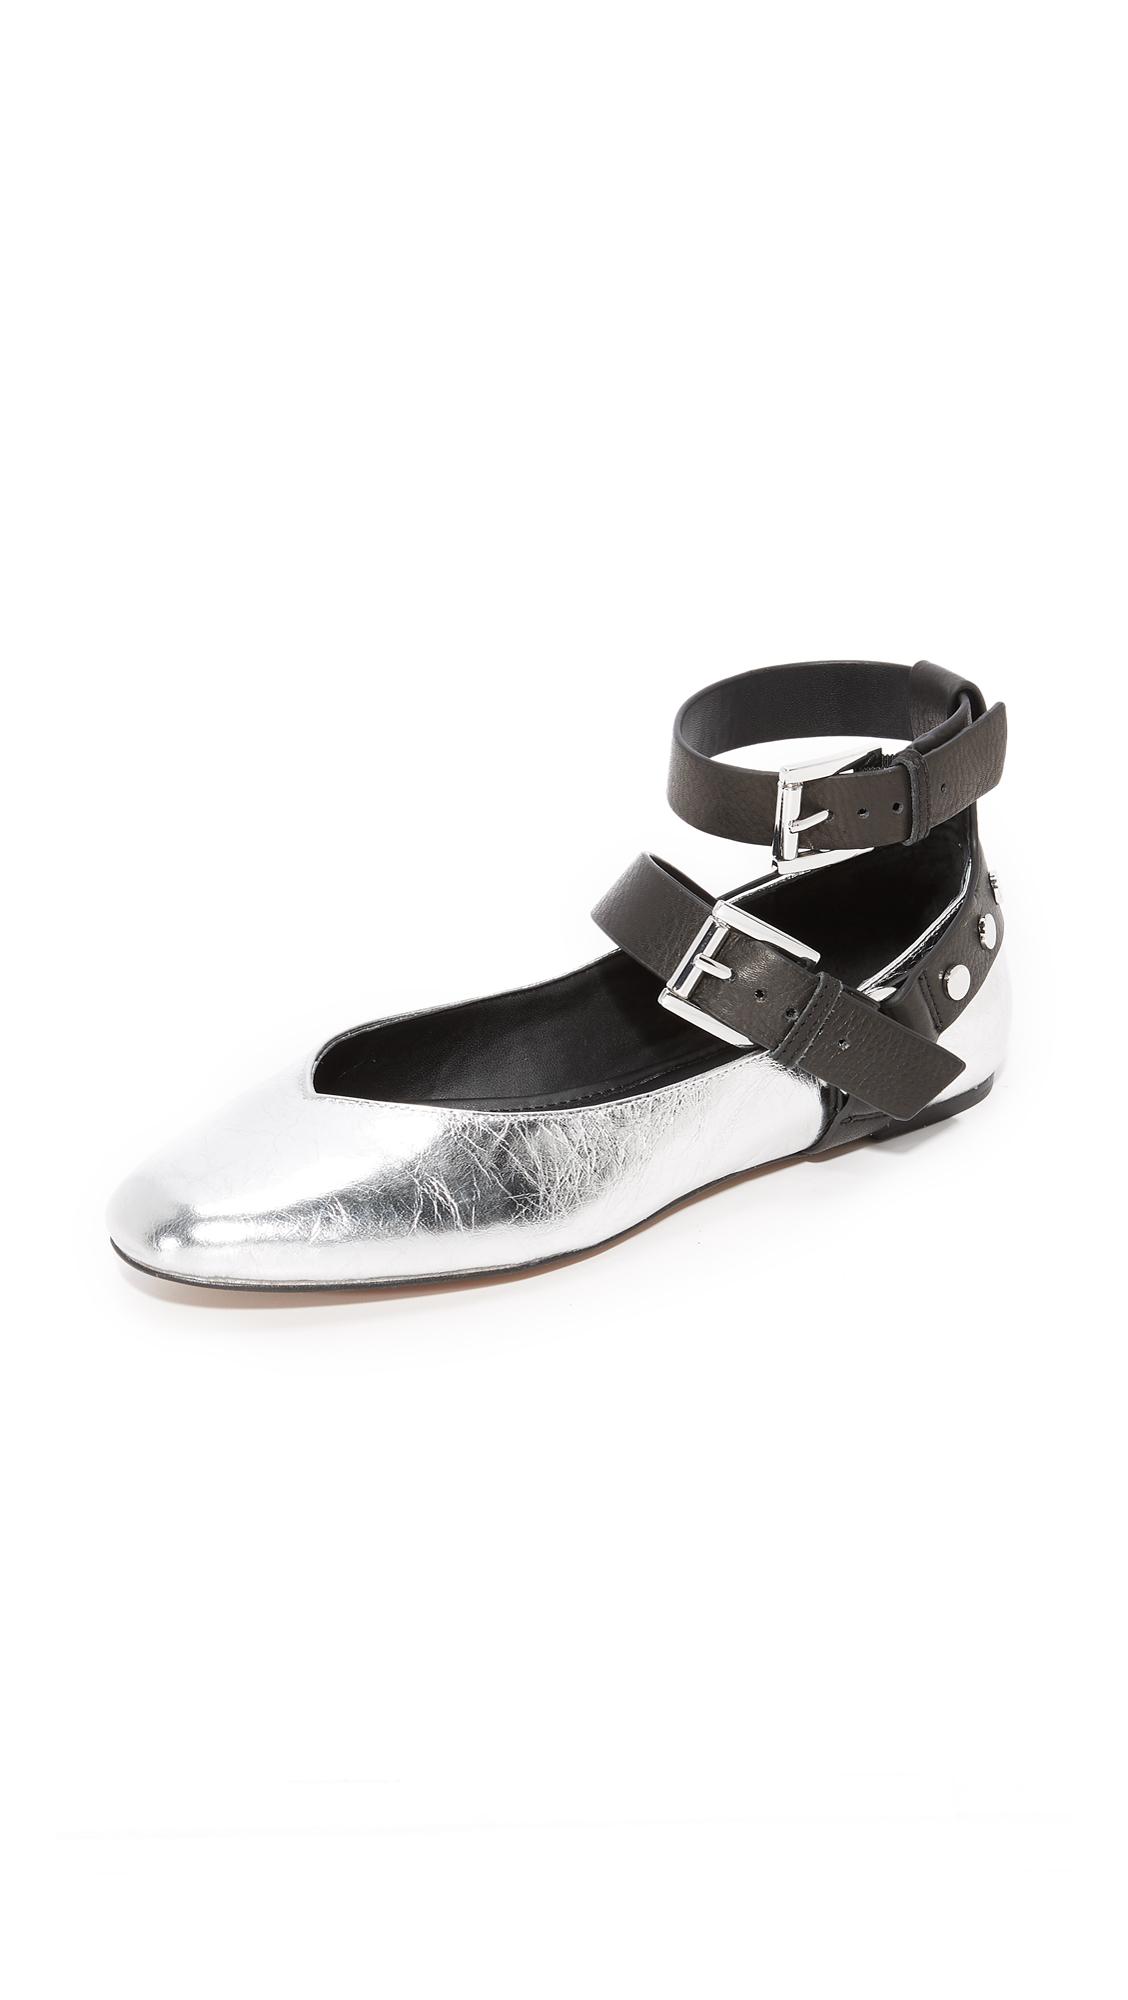 Rebecca Minkoff Vivica Harness Ballet Flats - Silver/Black